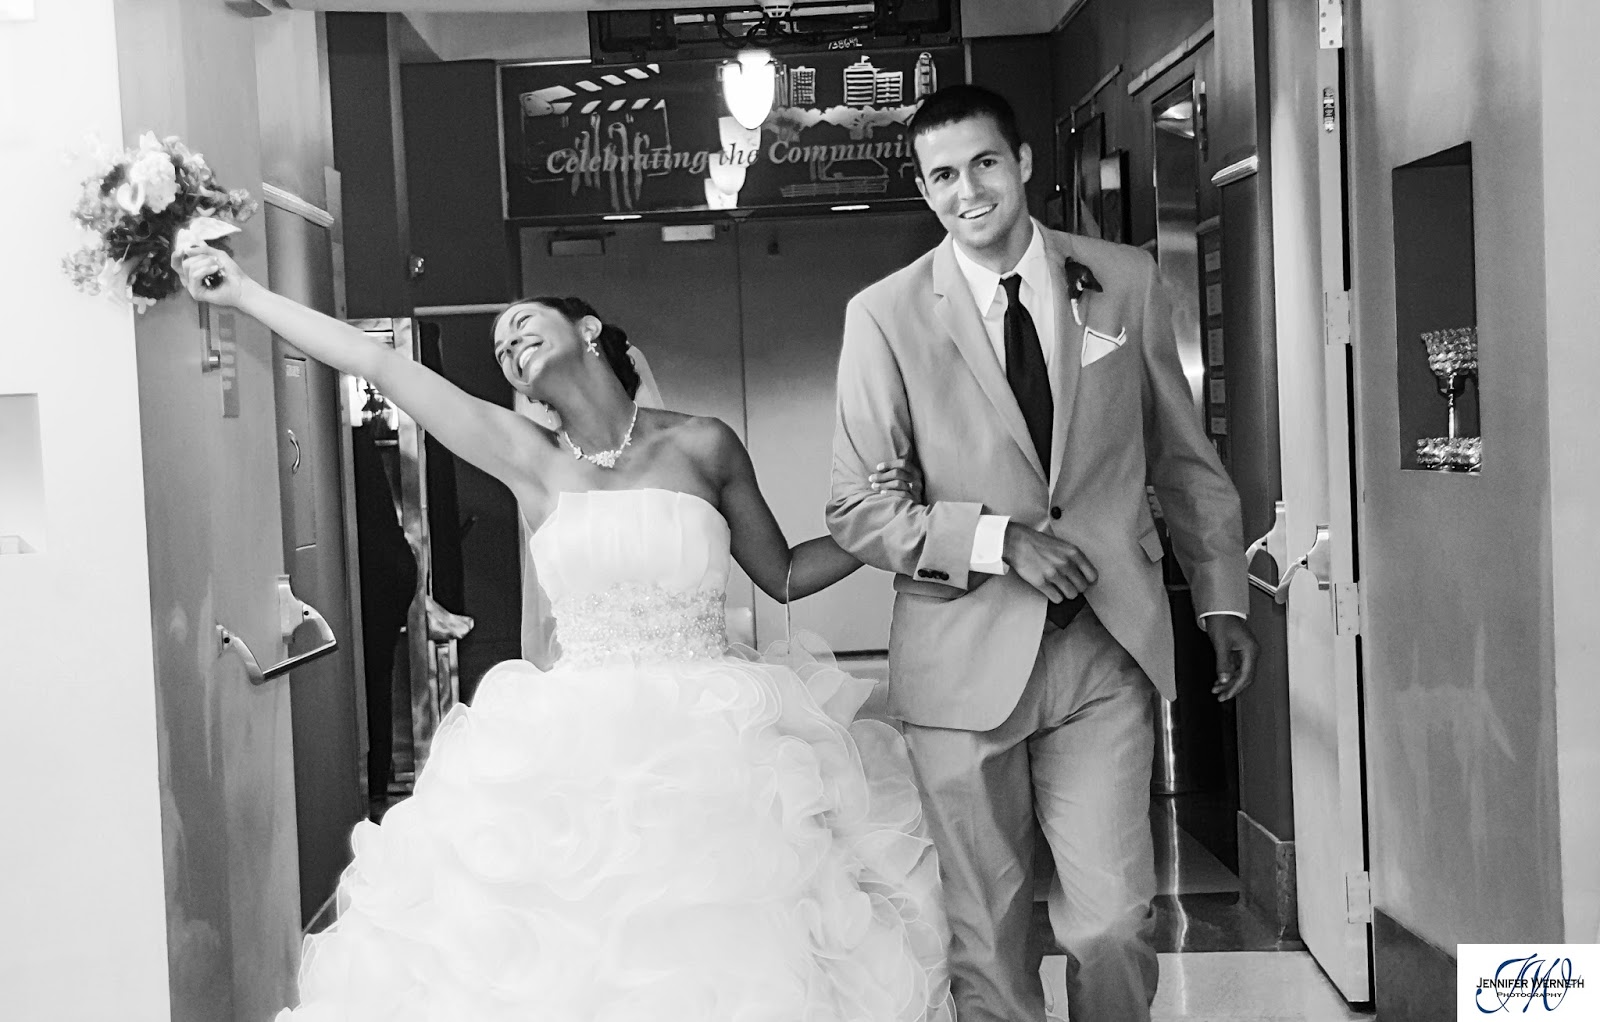 Affordable Wedding Photography Orlando: Posted ByJennifer Werneth At 1:14 PM